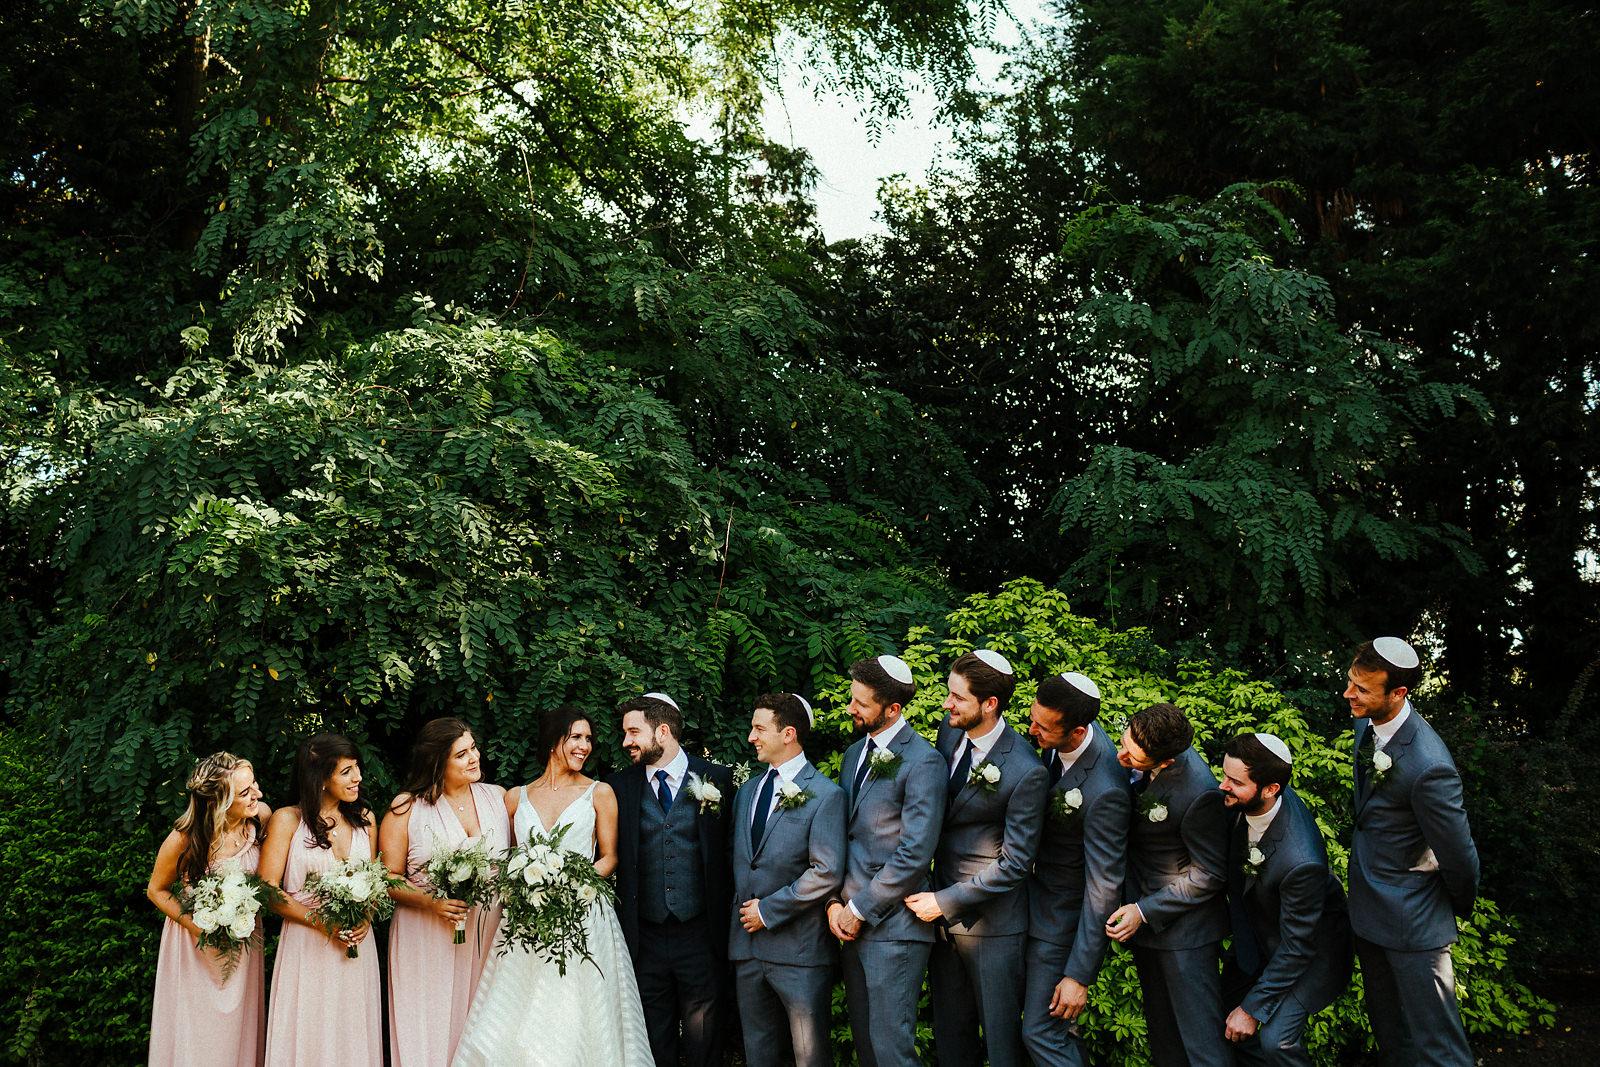 Jewish wedding couple bridal party